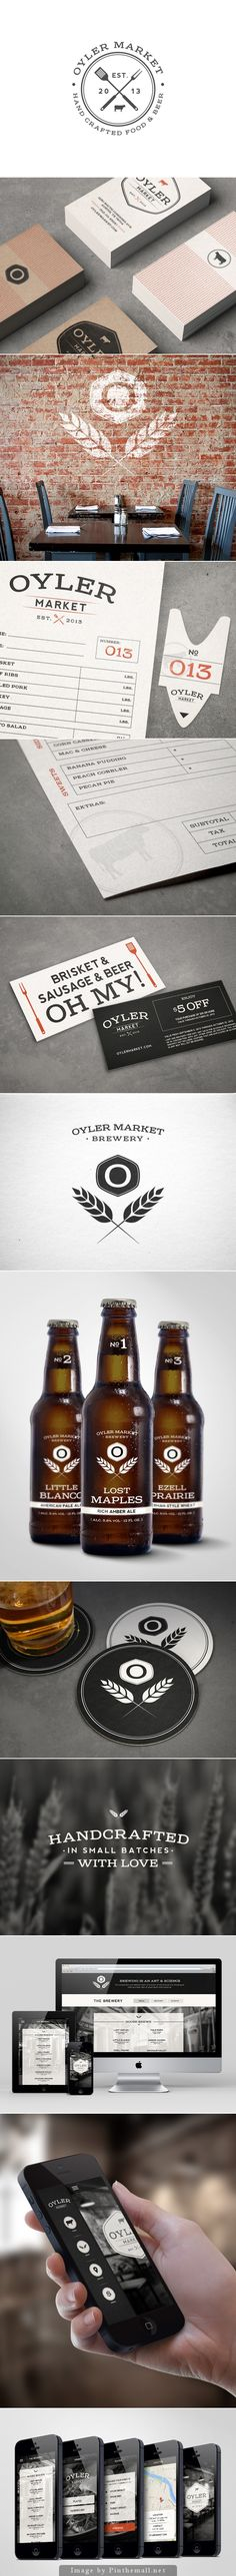 Oyler Market #branding #identity